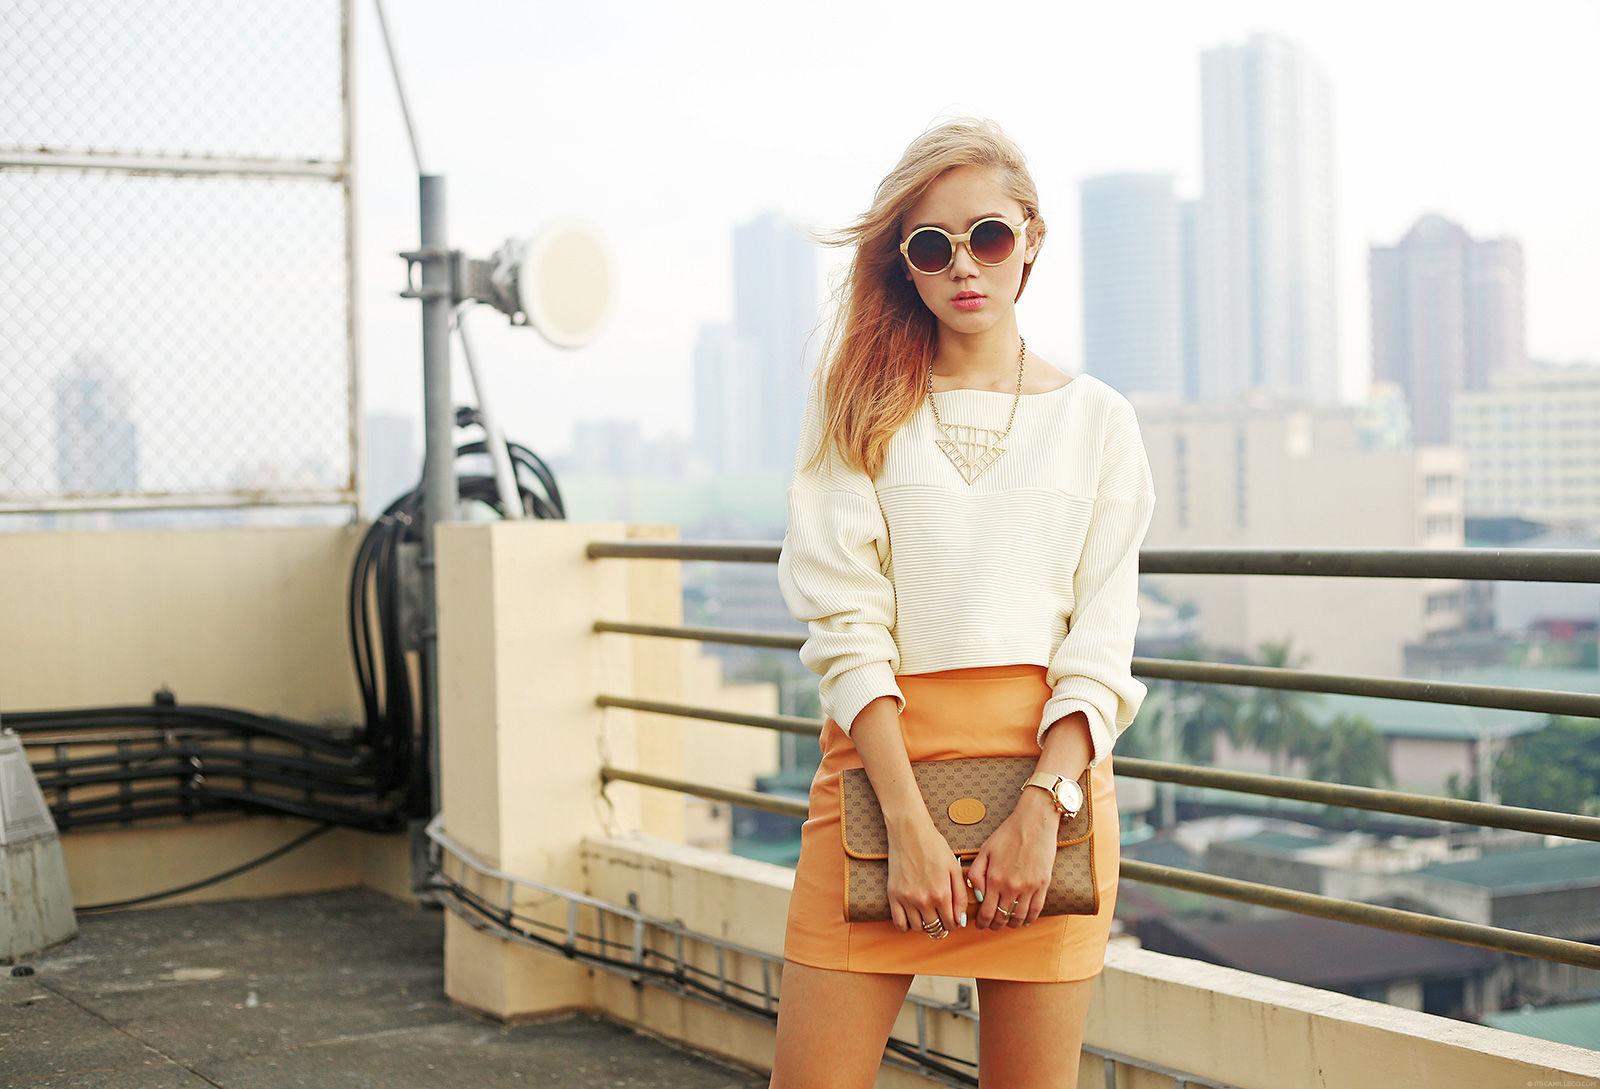 Triwa, H&M, Tandy fashion   Camille Tries To Blog